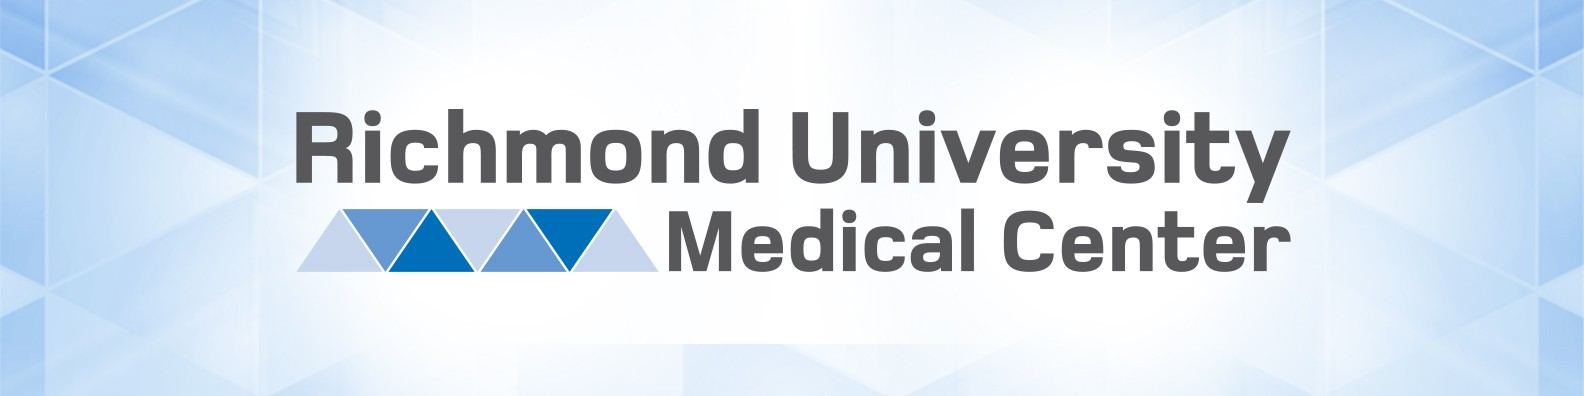 Richmond University Medical Center | LinkedIn